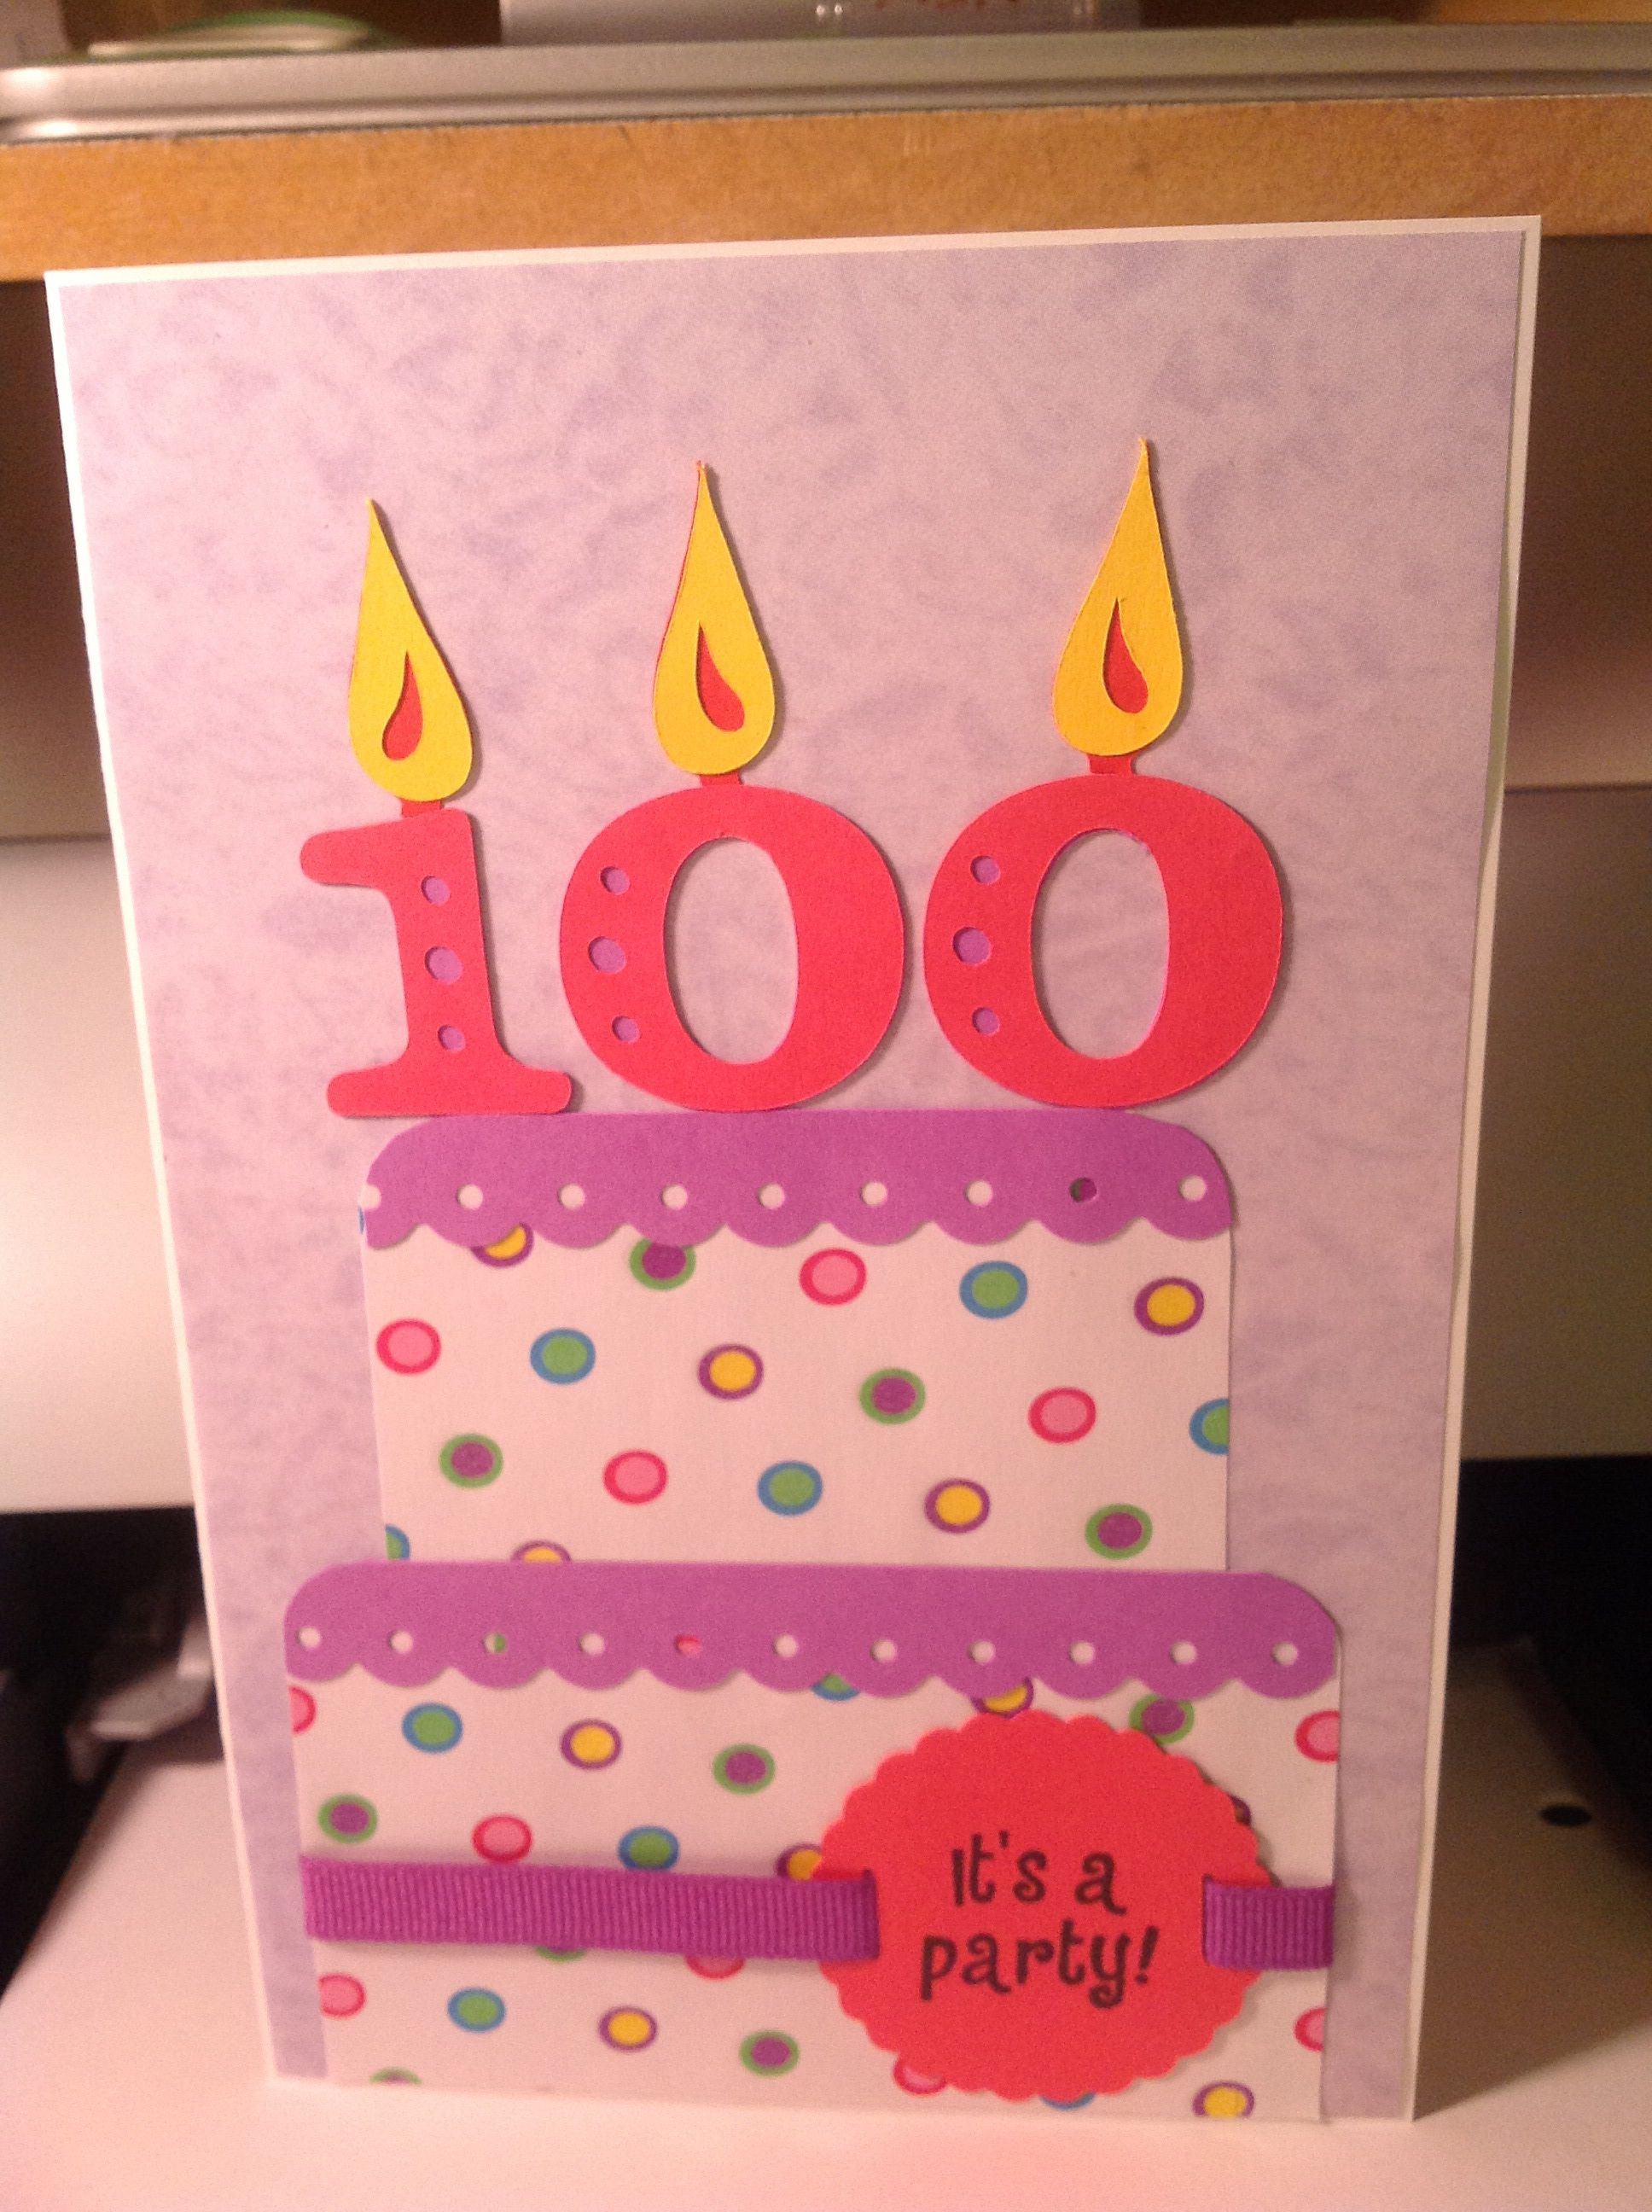 100 Years Birthday Card Old Birthday Cards 100th Birthday Card Birthday Card Messages